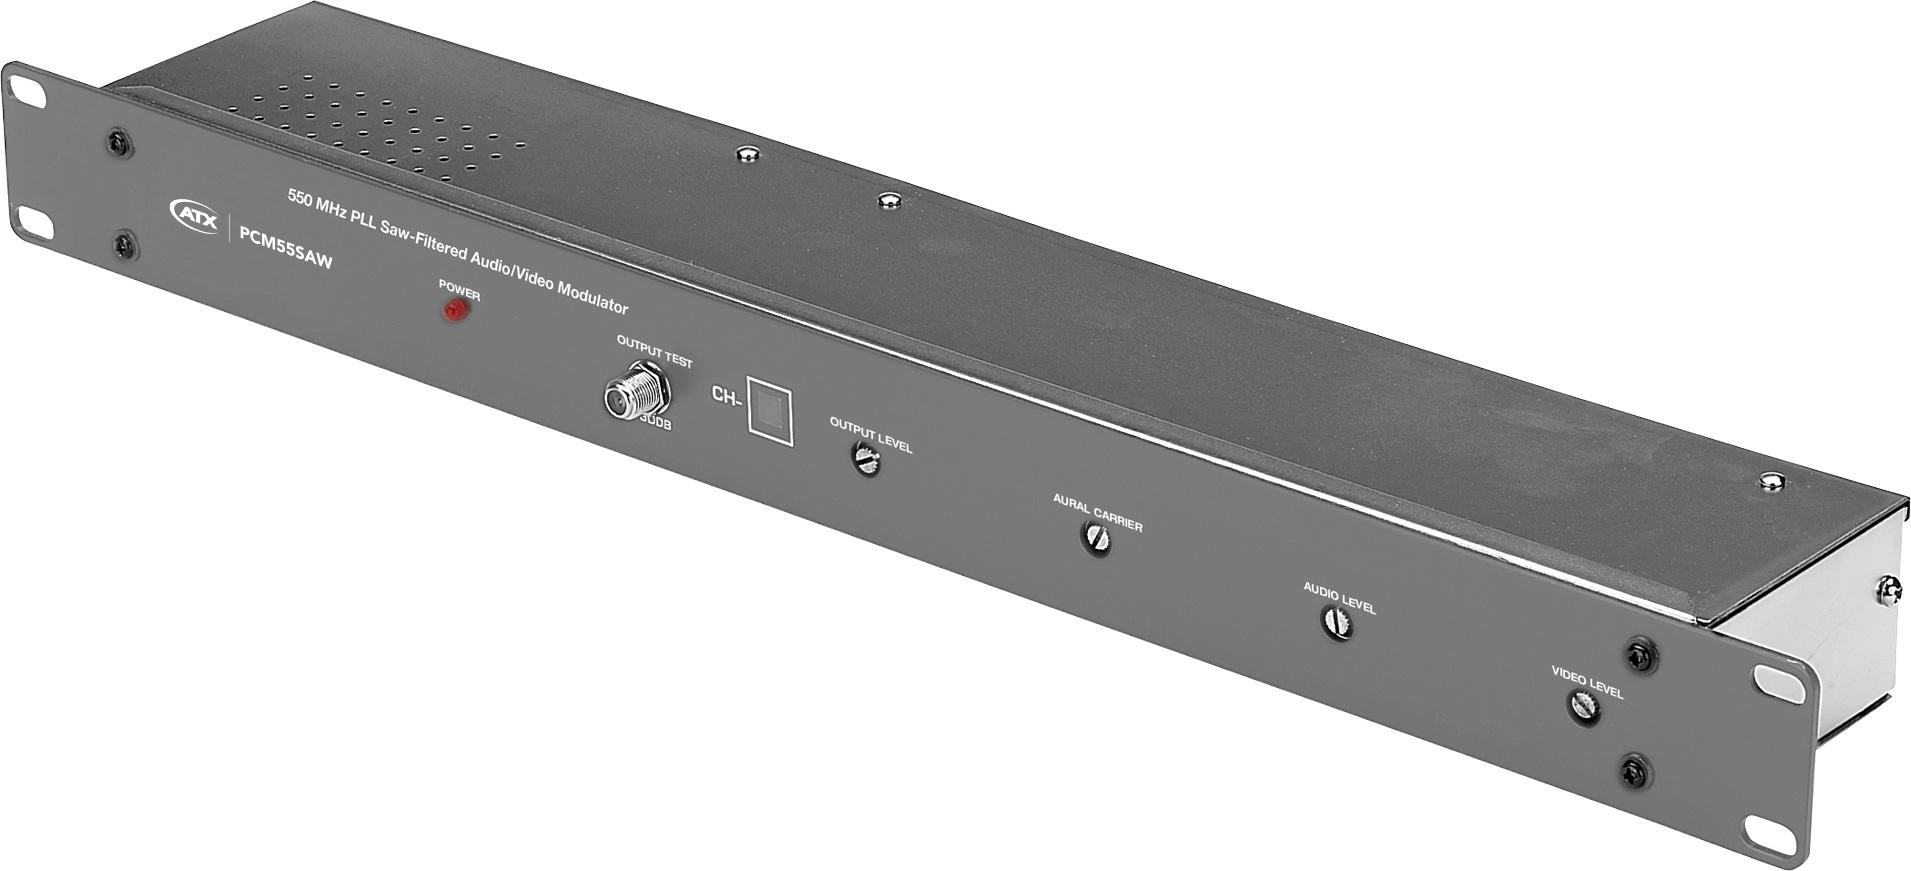 1 Channel Crystal A/V Modulator - Channel 5 PM-PCM55SAW-5